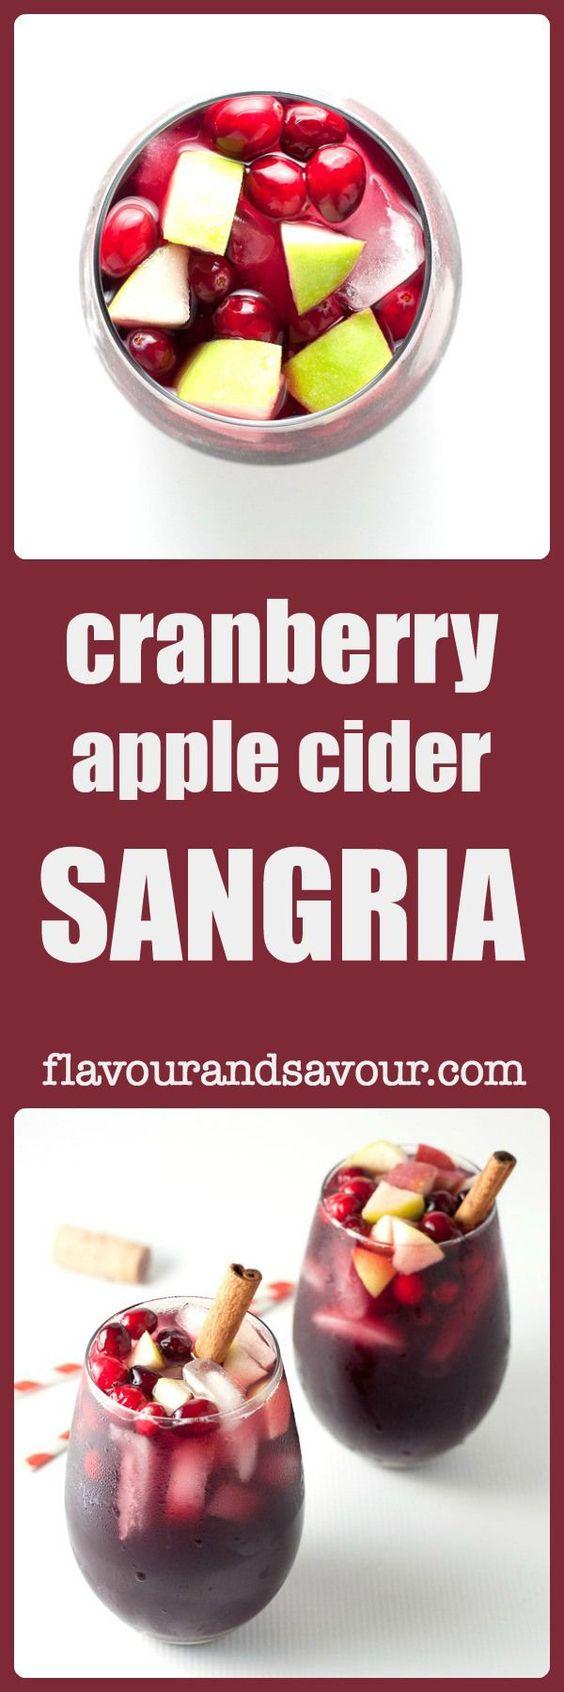 simple apple cider sangria sangria apples recipes for drinks ...